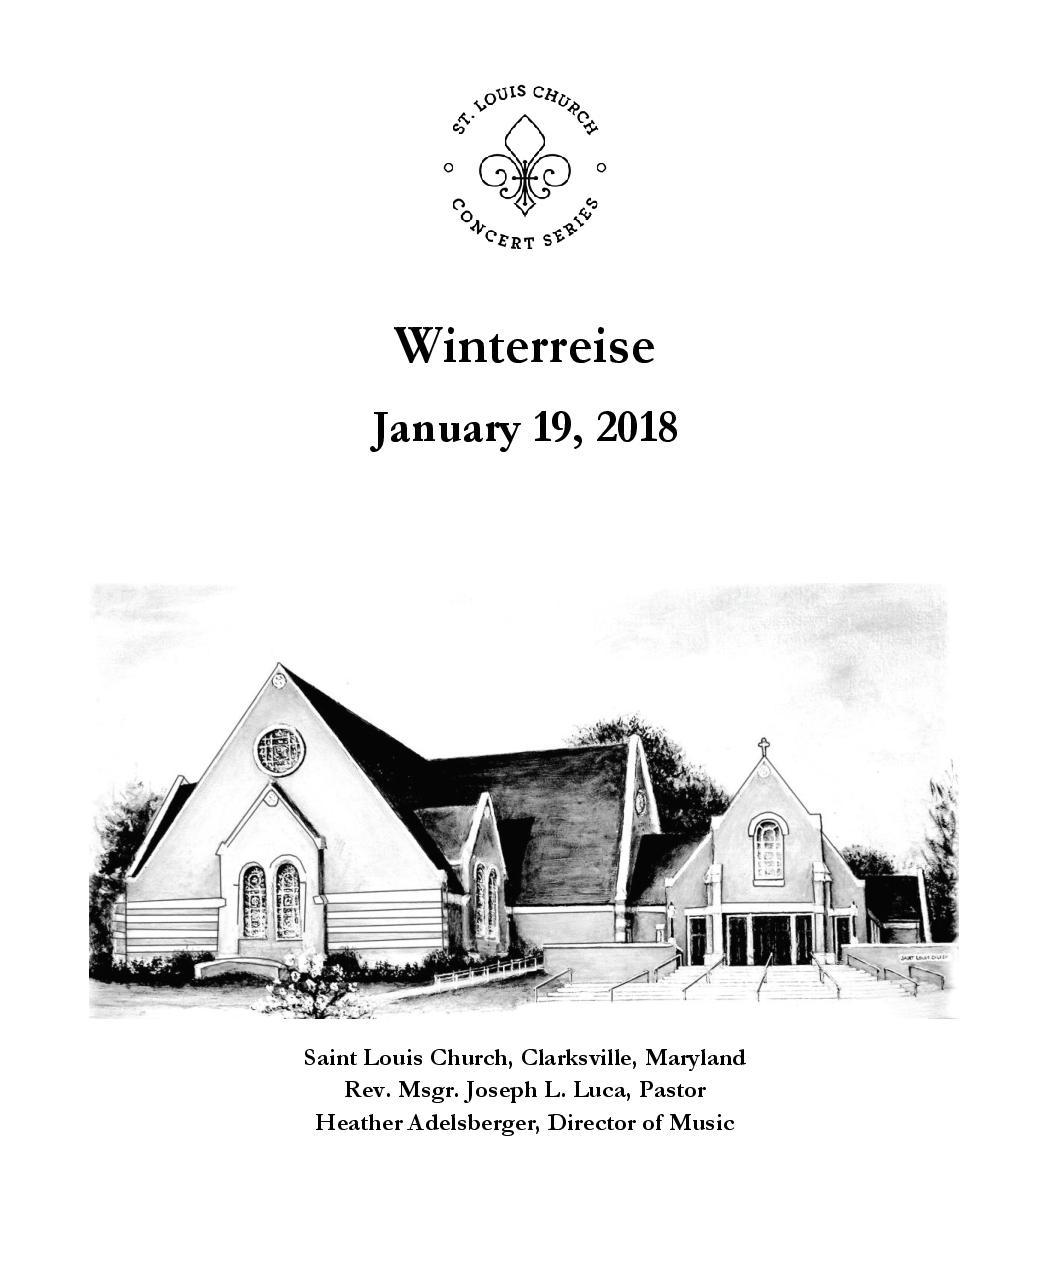 WinterreiseProgram_FINAL-page-001.jpg